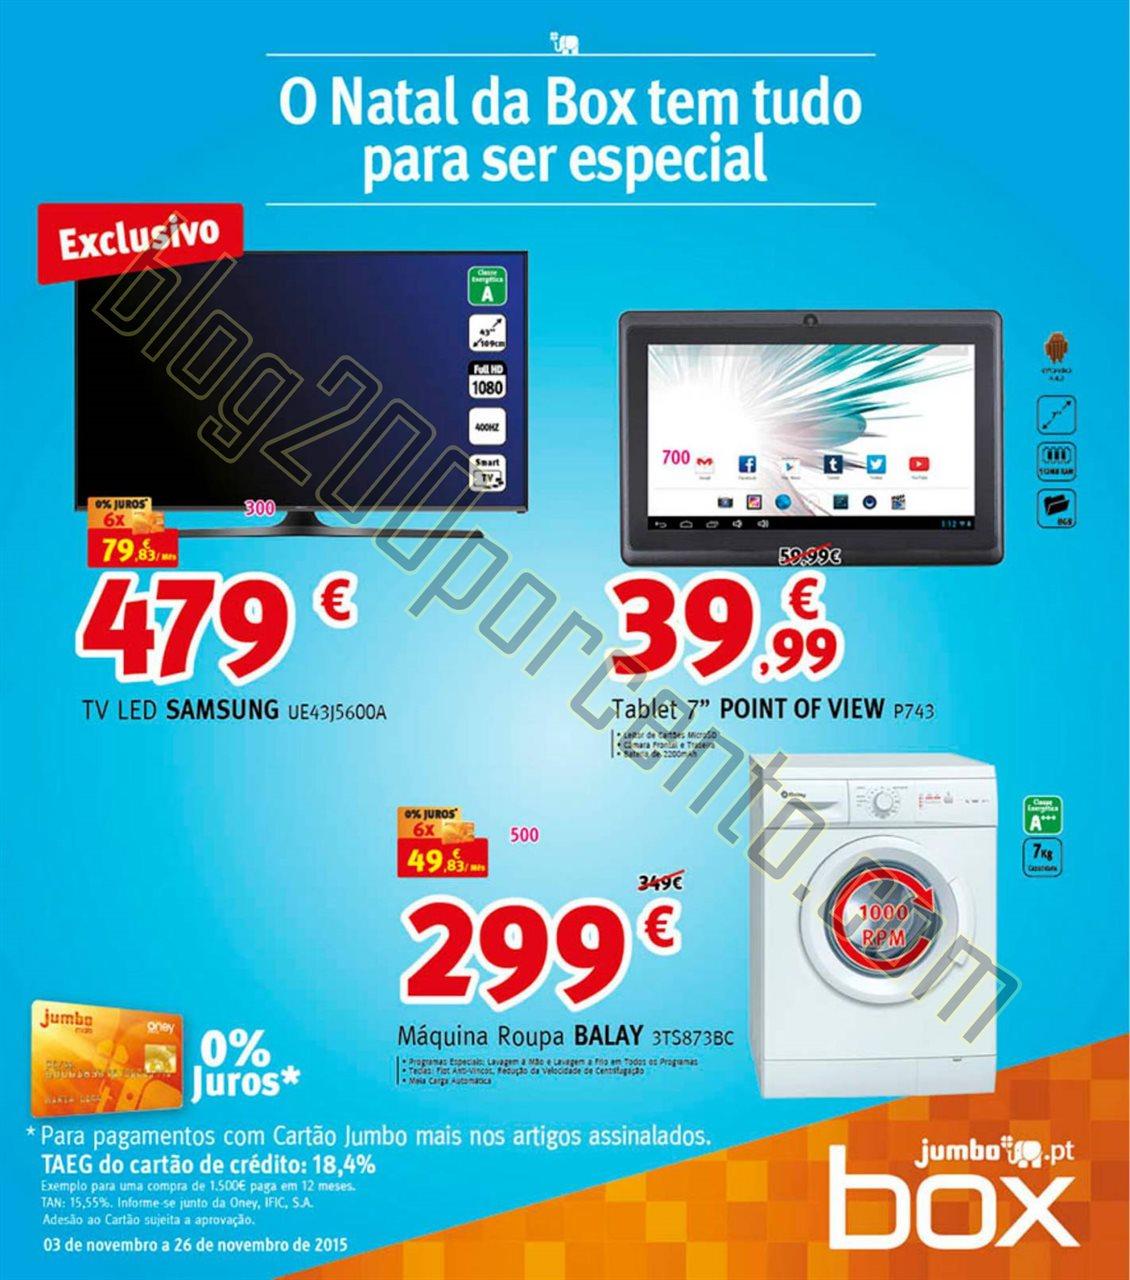 Antevisão Folheto JUMBO - BOX Natal promoções d